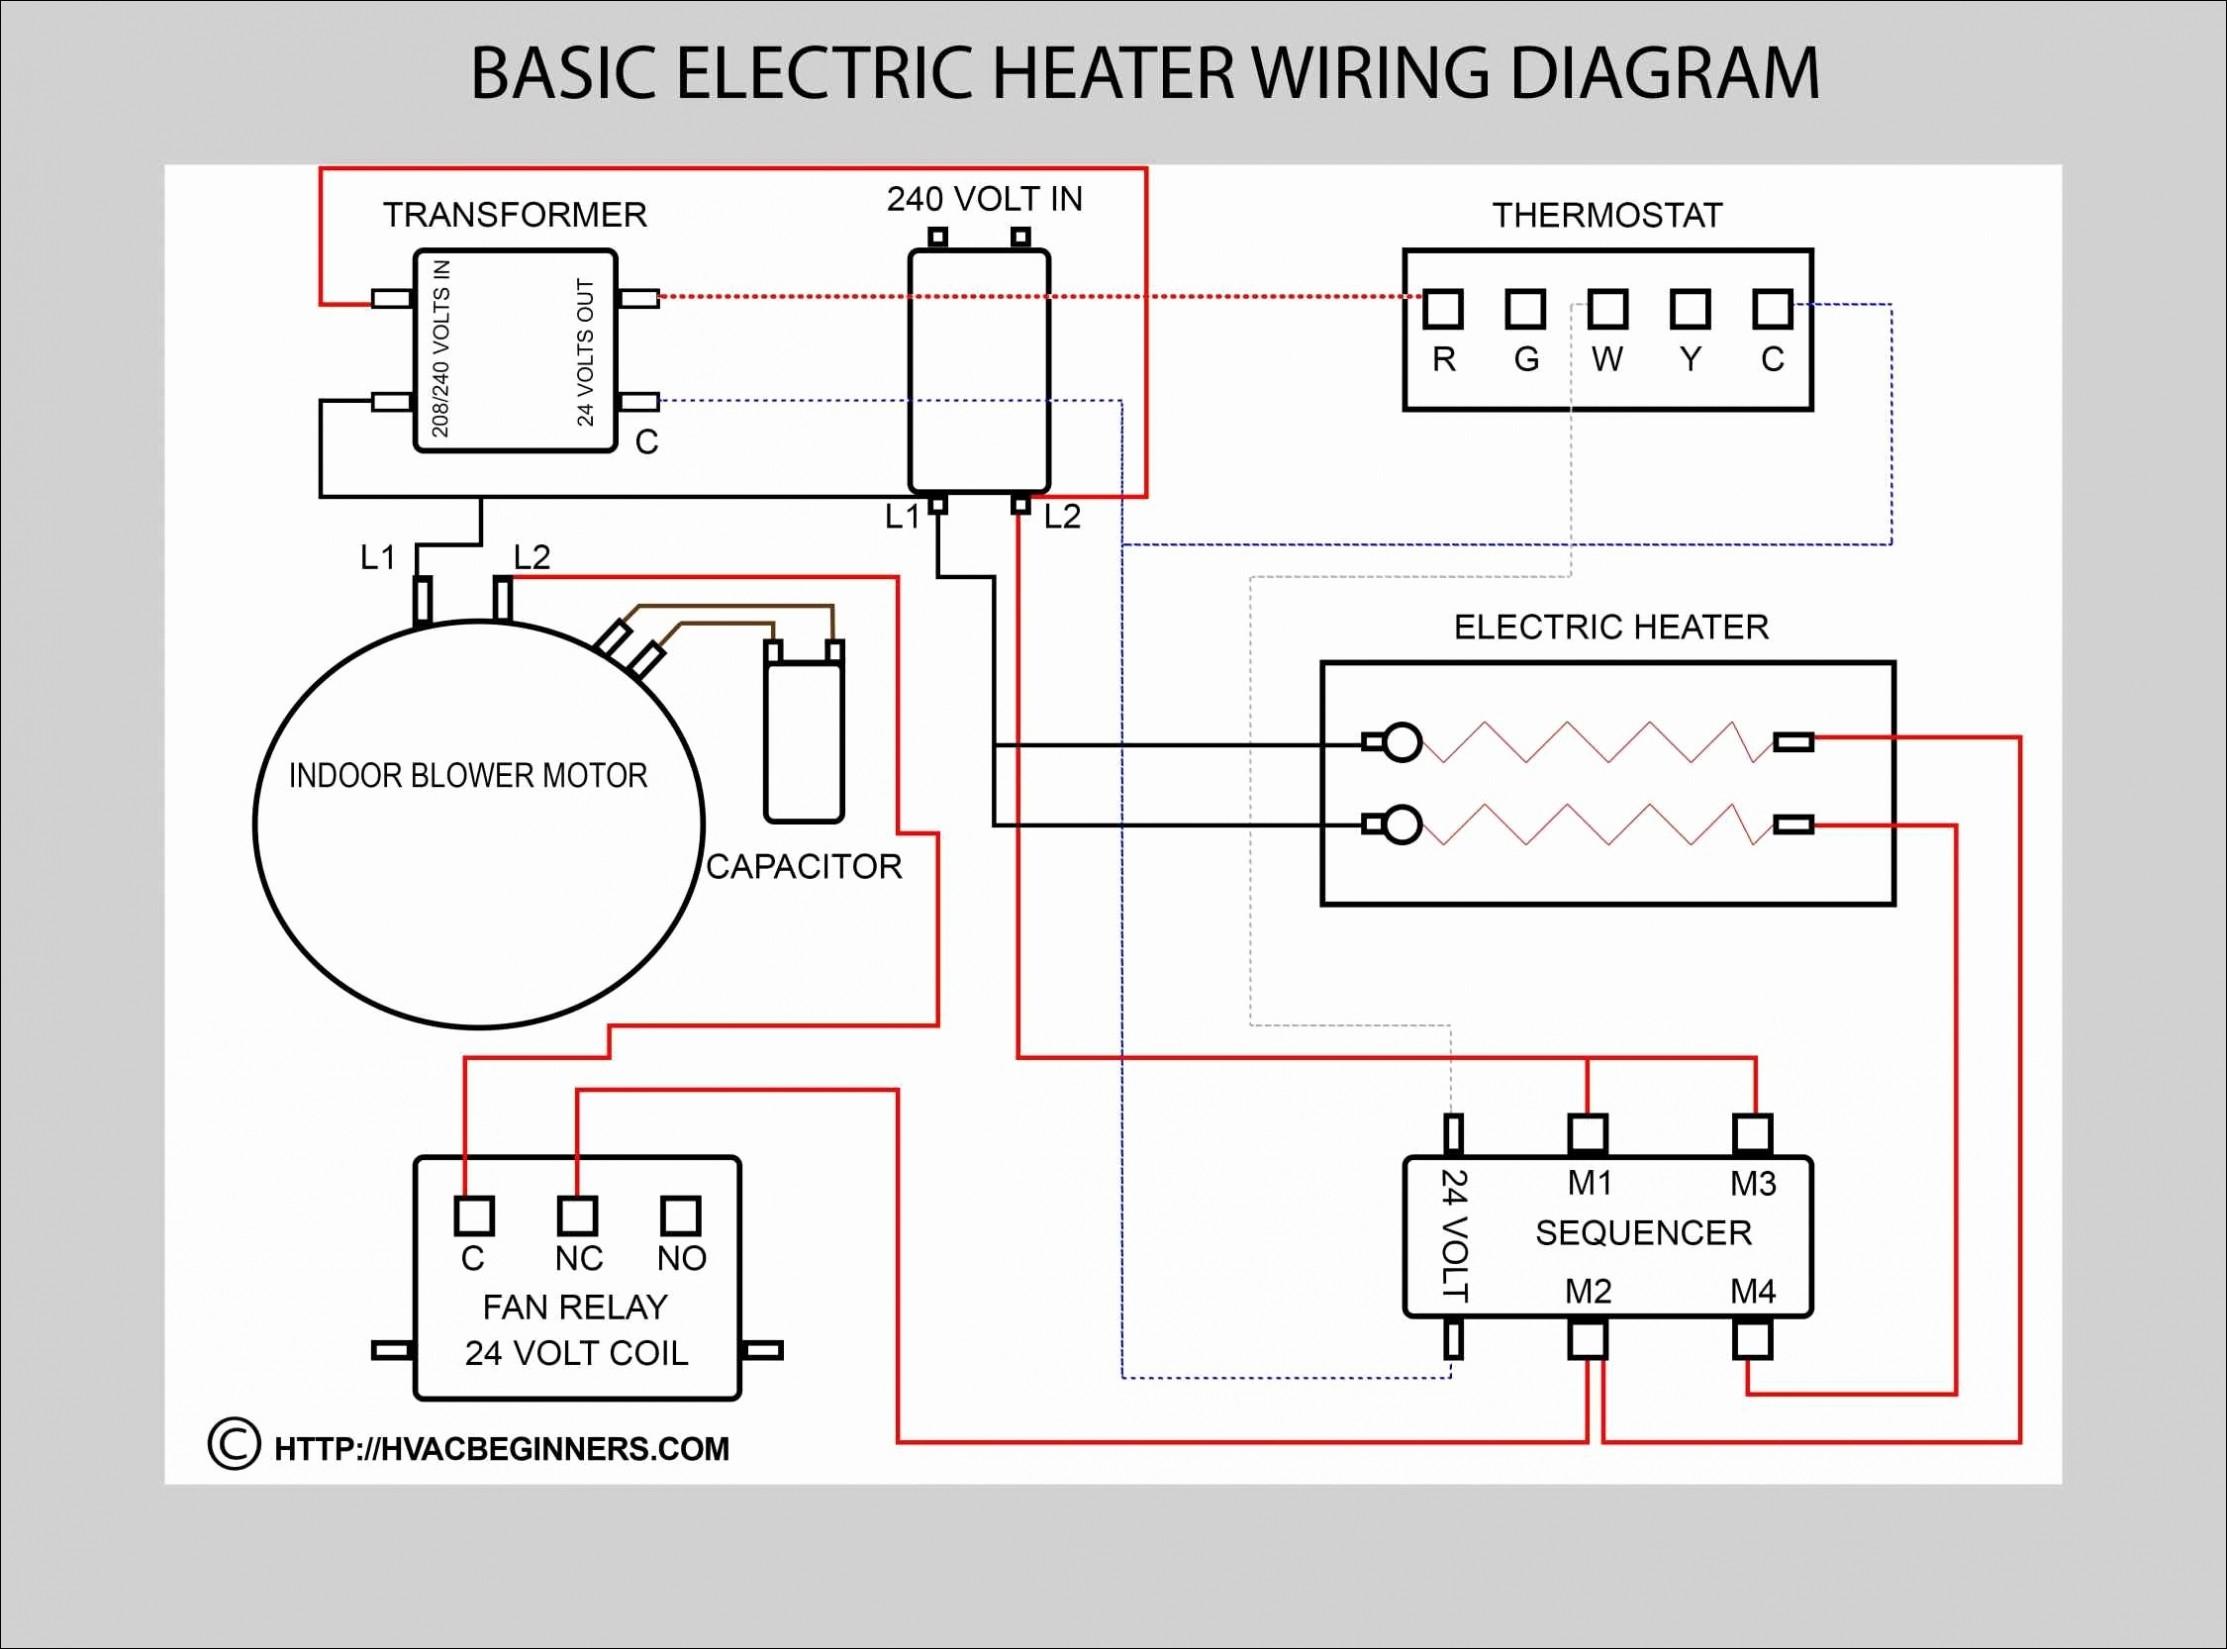 lor dmx wiring diagram wiring library dmx to · 5 pin power window switch wiring diagram 5 pin power window switch